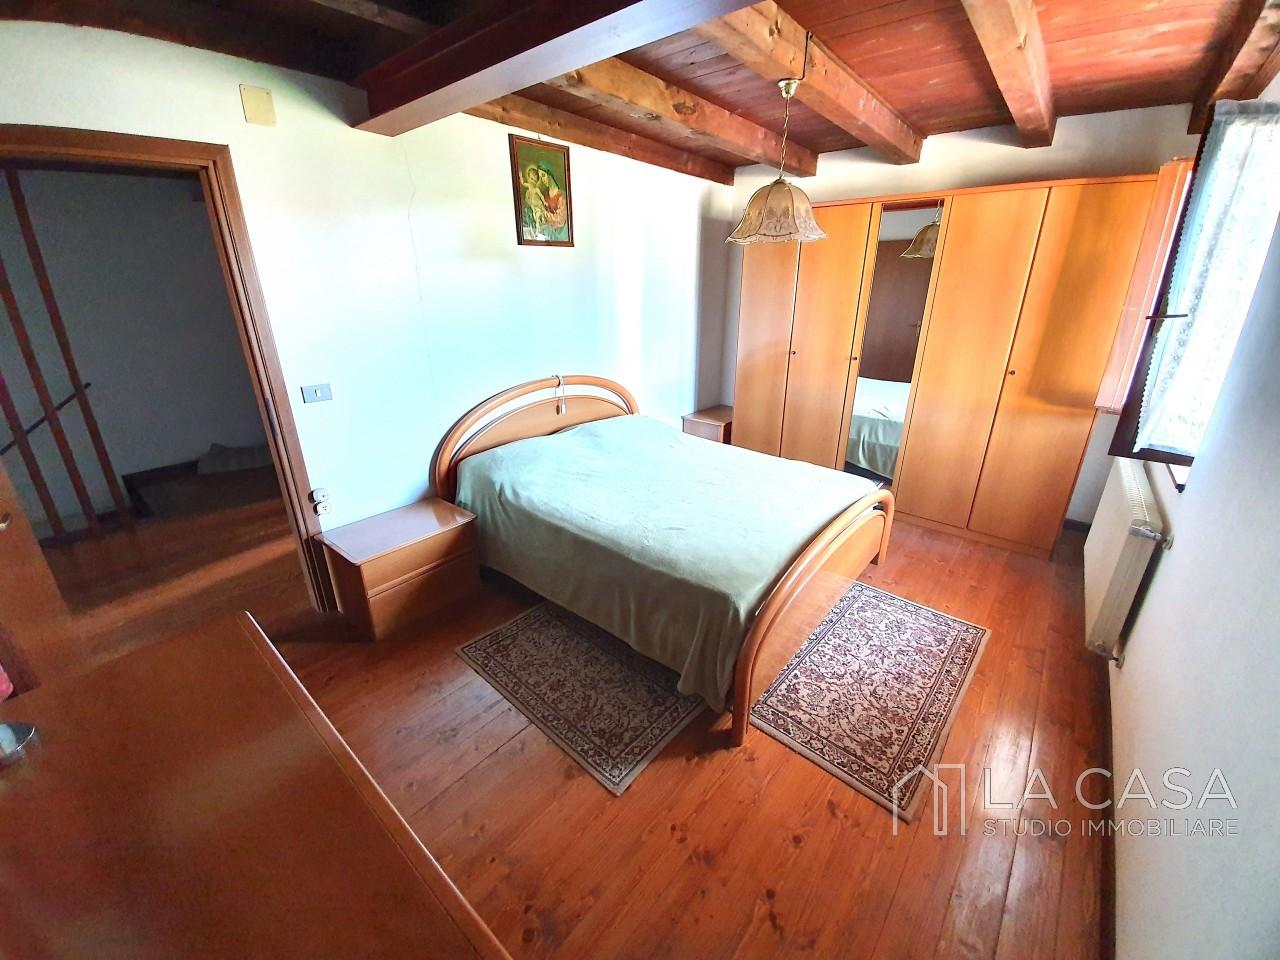 Casa indipendente in Linea - Rif.C6 https://media.gestionaleimmobiliare.it/foto/annunci/191125/2114313/1280x1280/015__20191125_115828_wmk_1.jpg